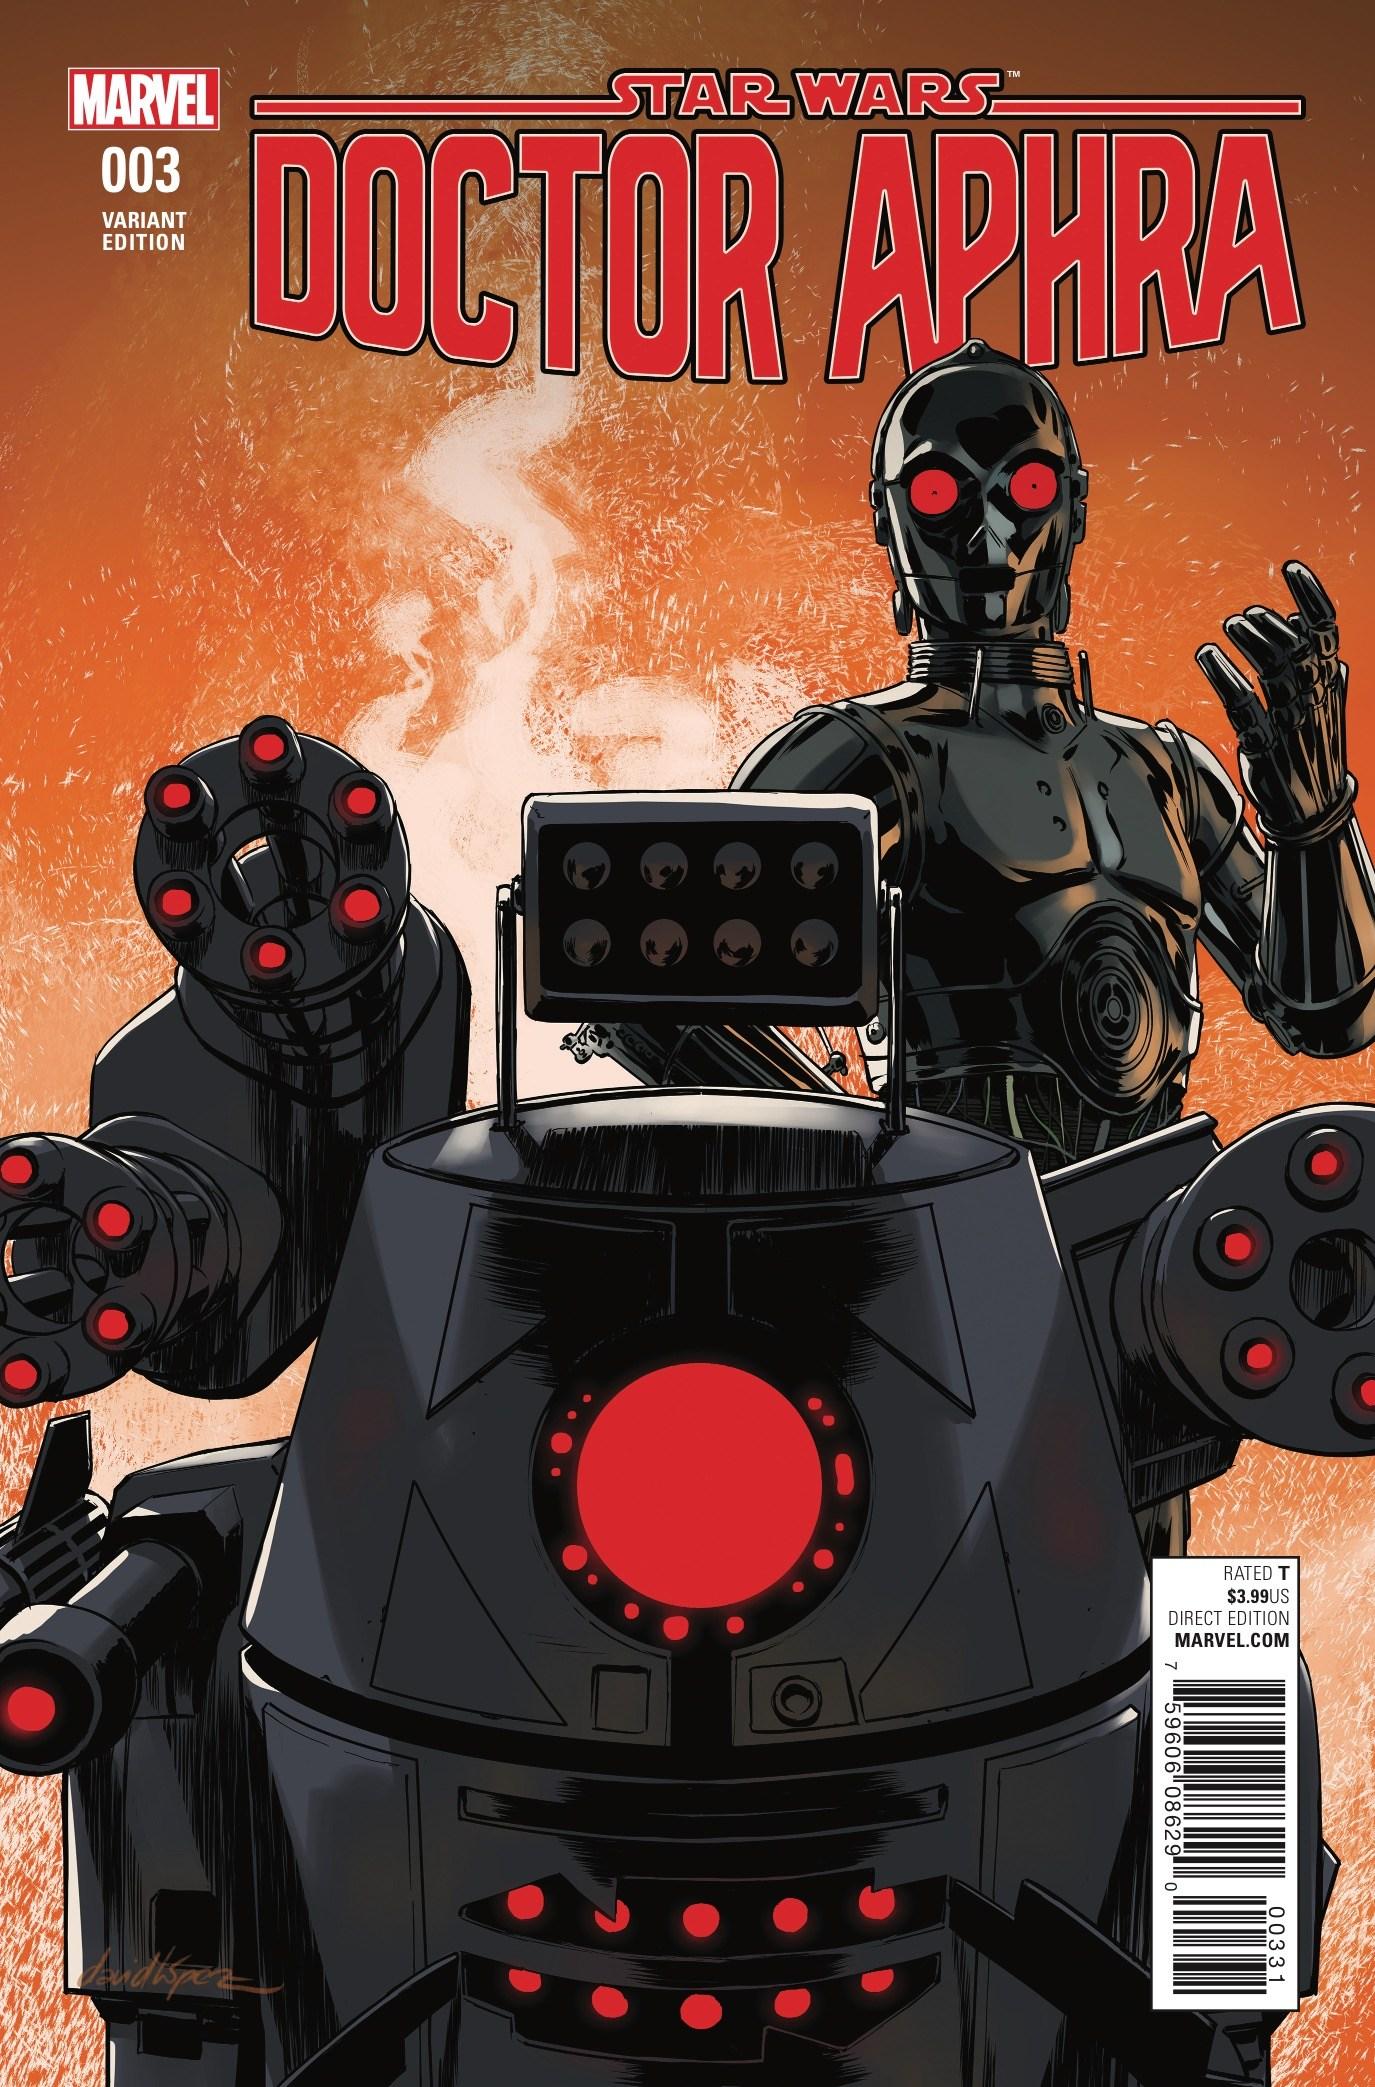 Doctor Aphra #3 (David Lopez Droids Variant Cover) (18.01.2017)